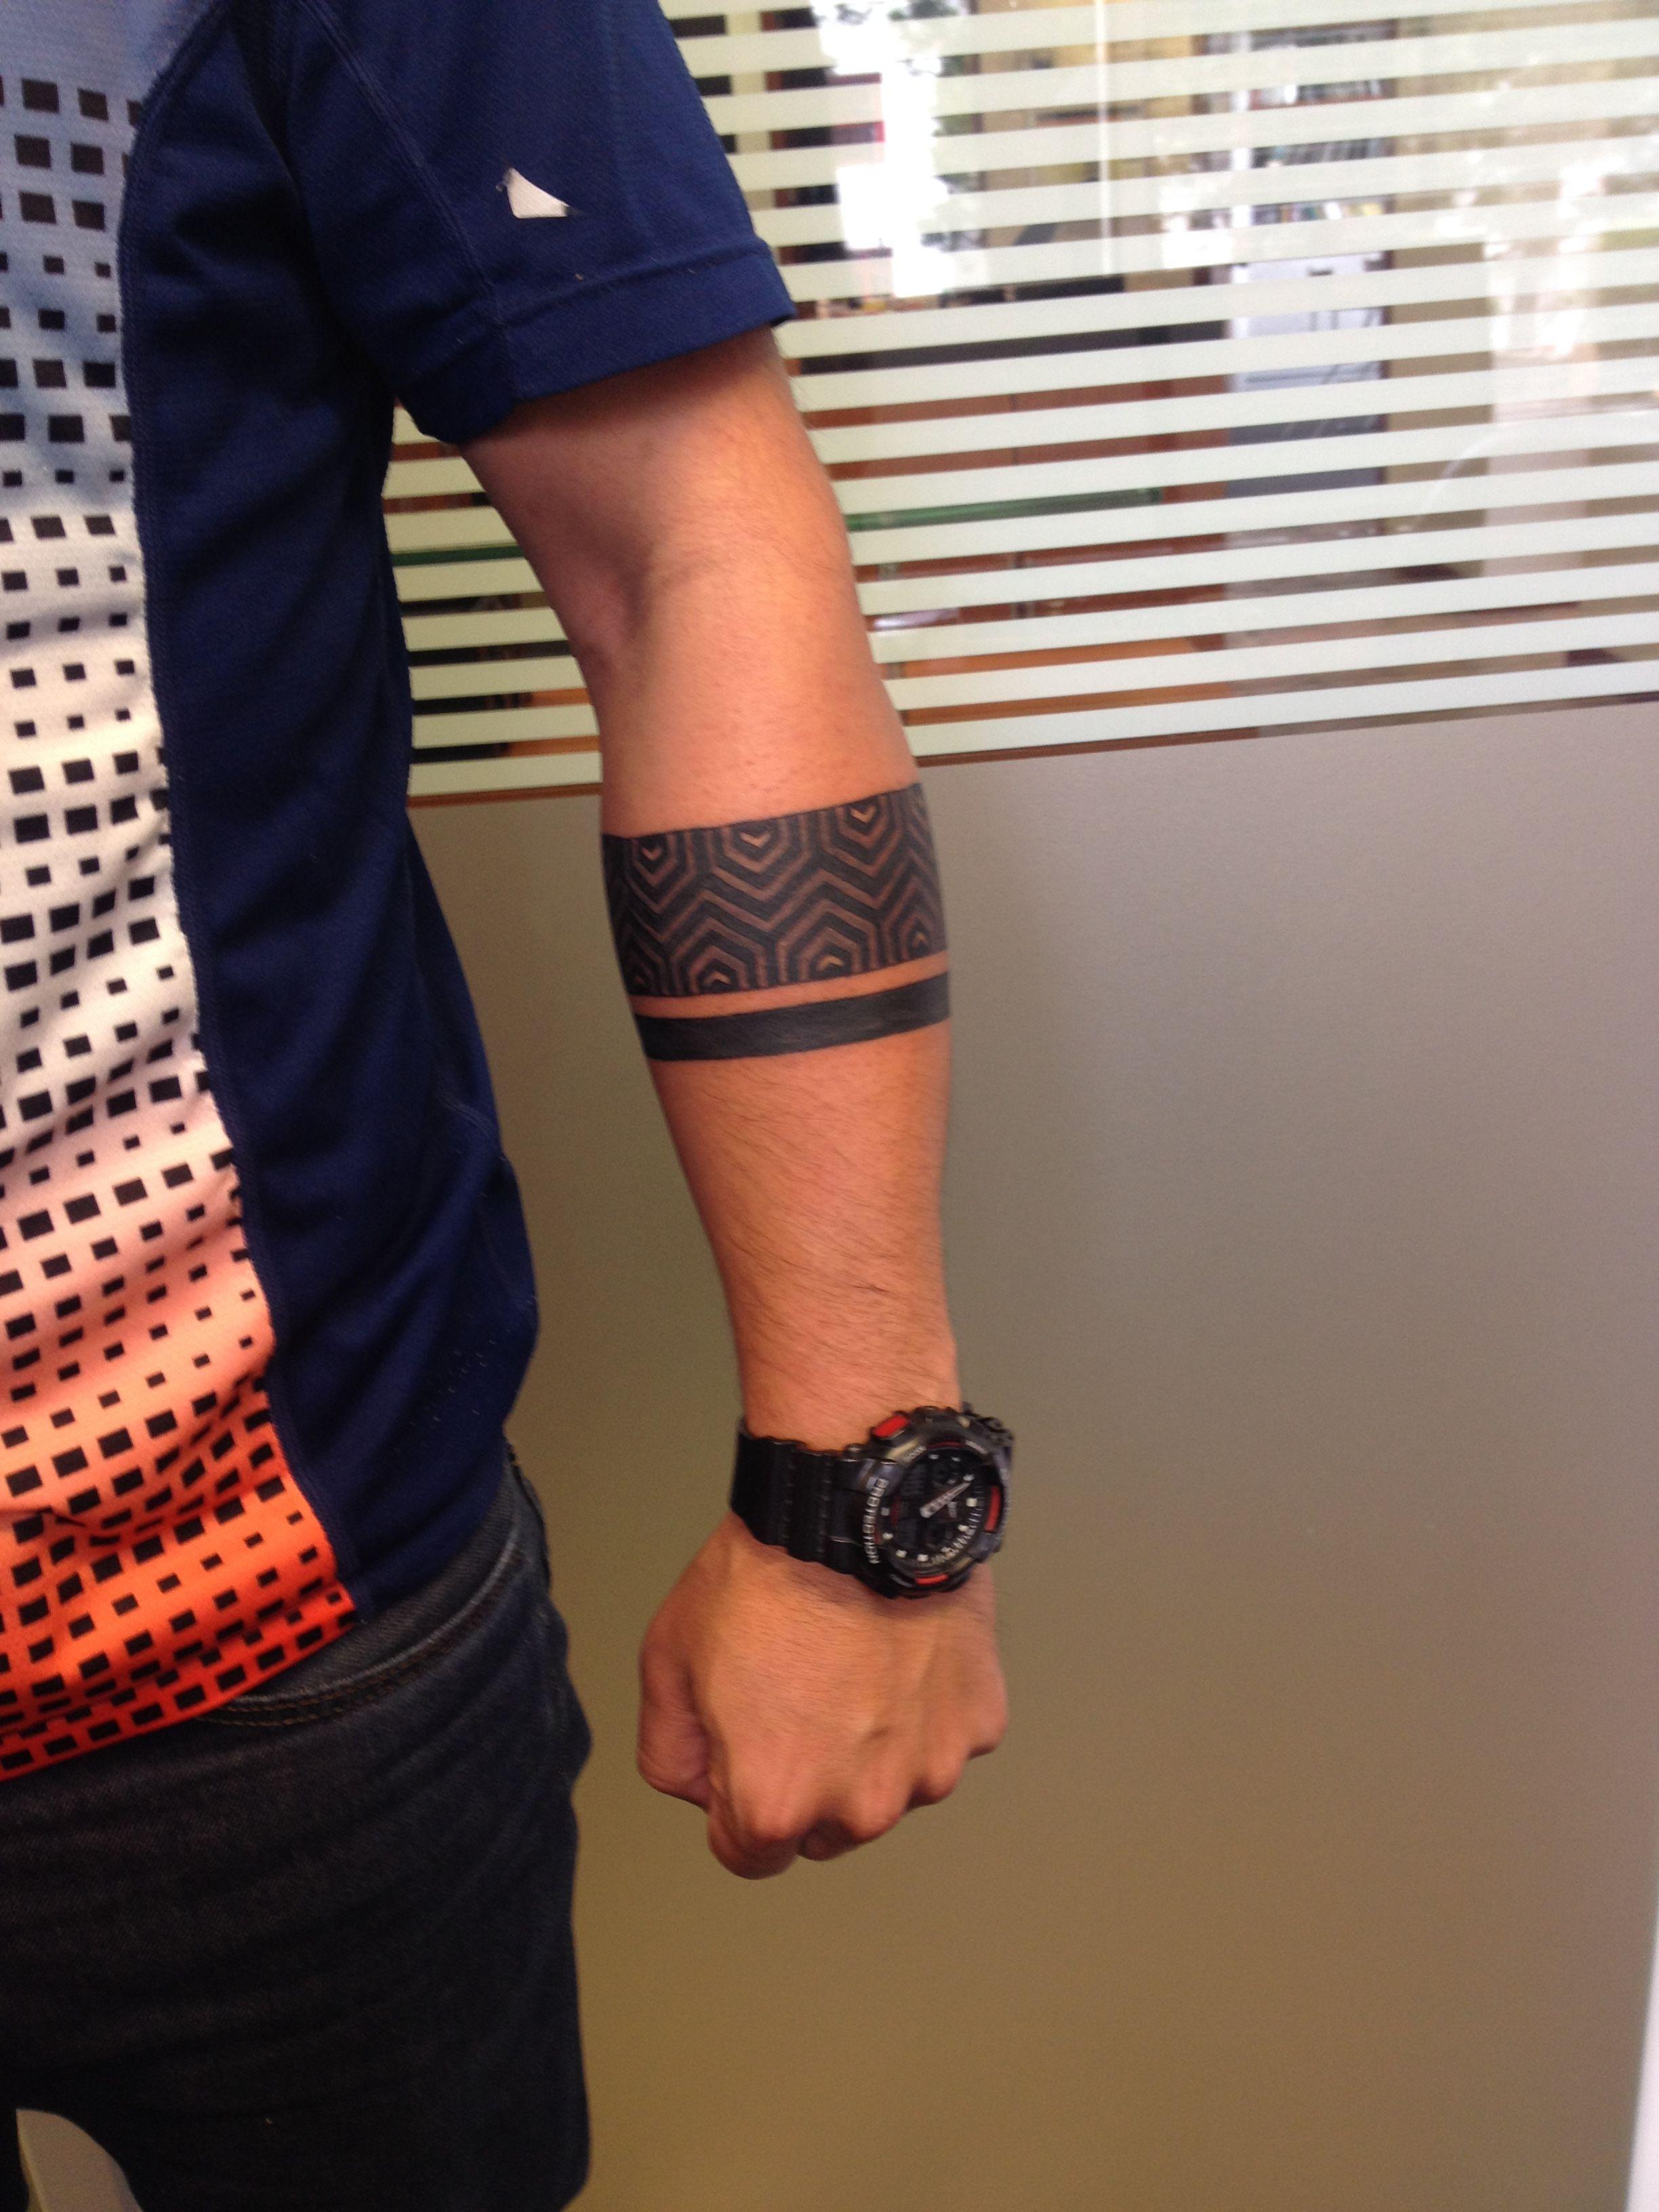 Armband Tattoo Men Geometric Mola Pinterest Tatuajes